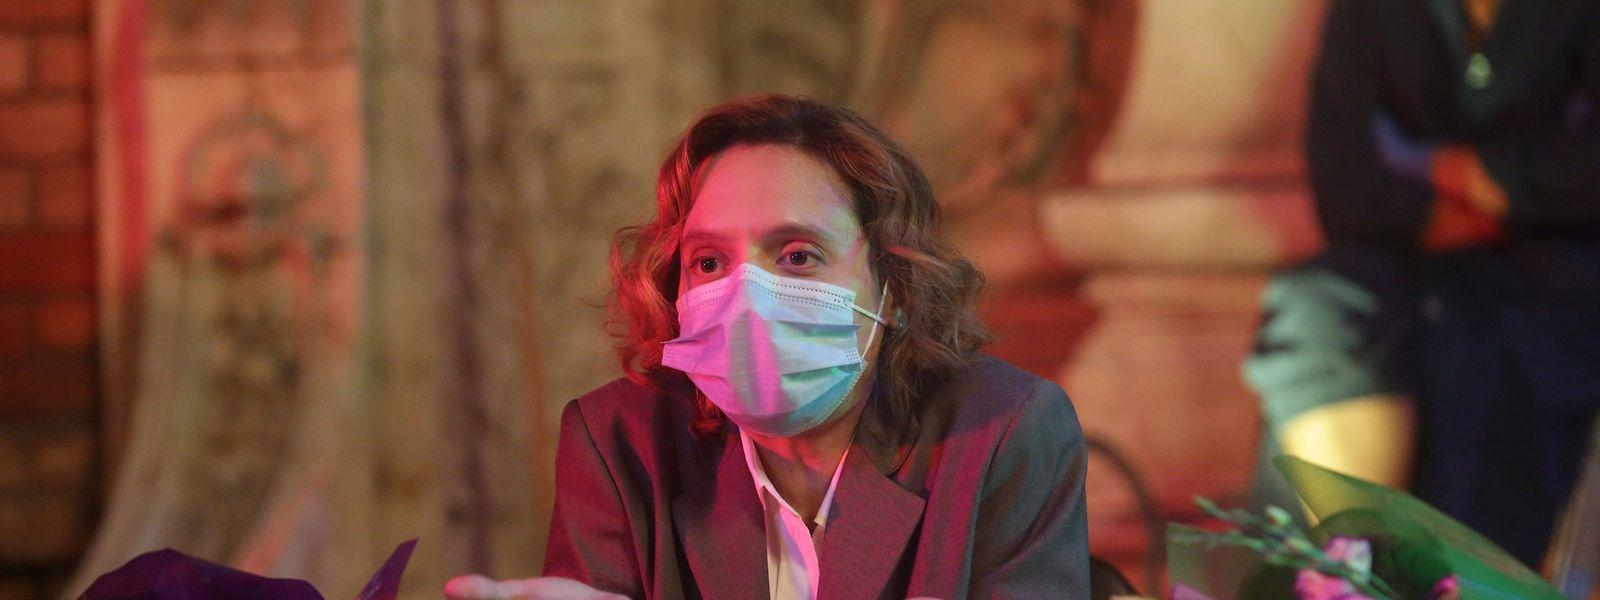 "Katia Pascariu (ob.) spielt die Hauptrolle im Wettbewerbsbeitrag ""Bad Luck Banging or Looney Porn""."